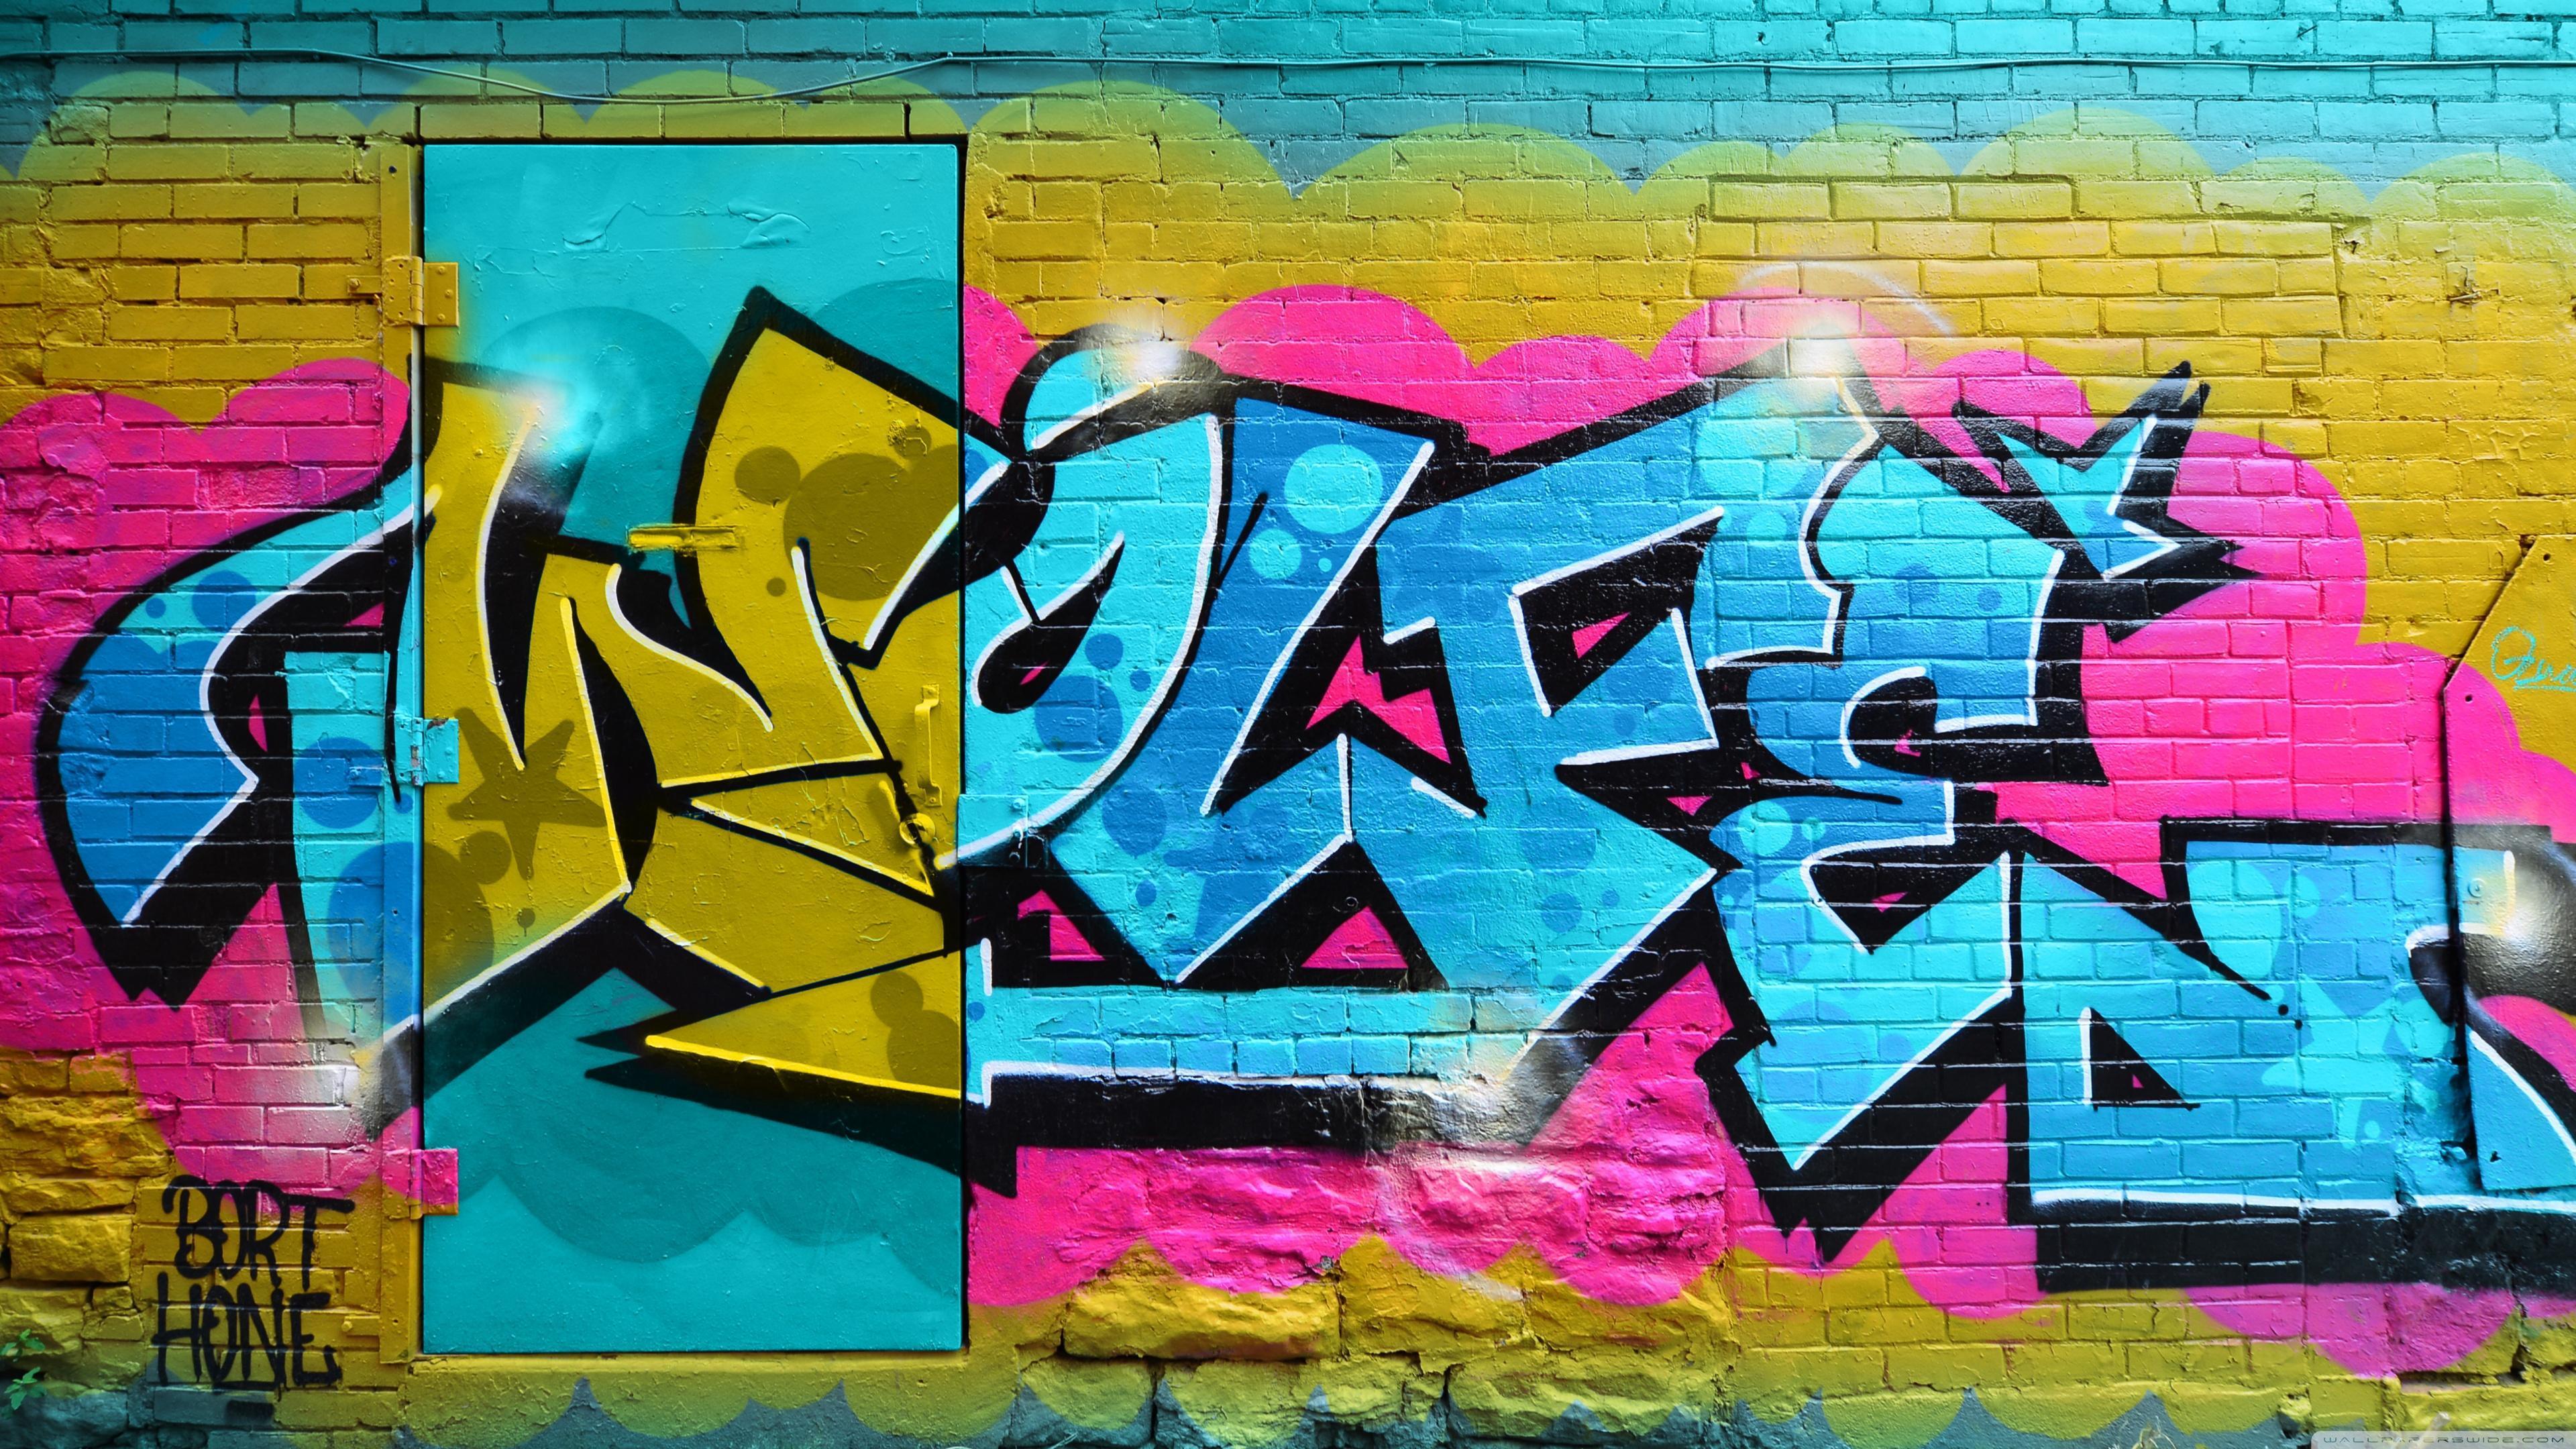 Graffiti Wallpaper 3D HD For Android APK Download